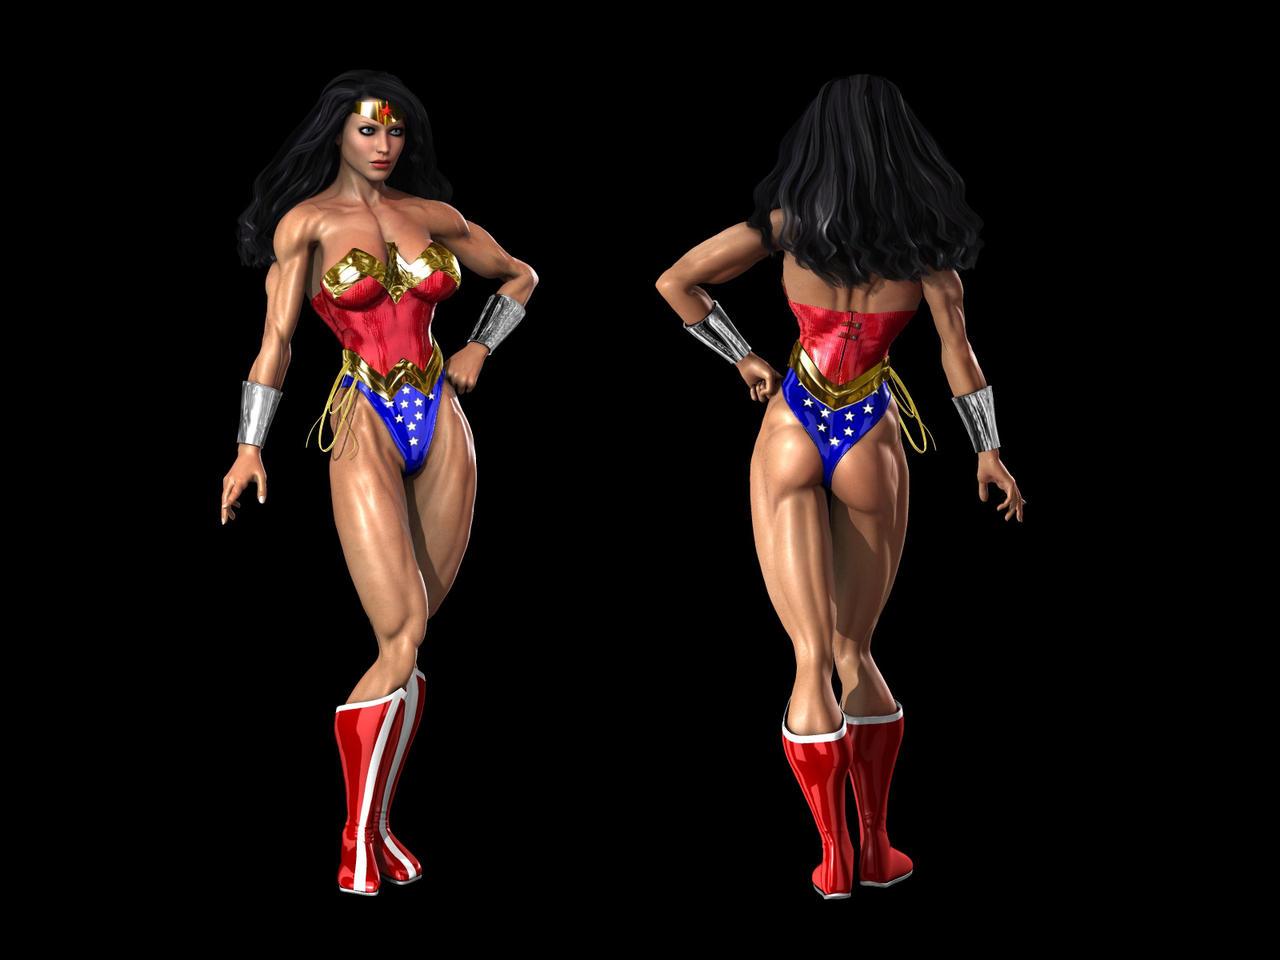 Wonder woman by Tigersan